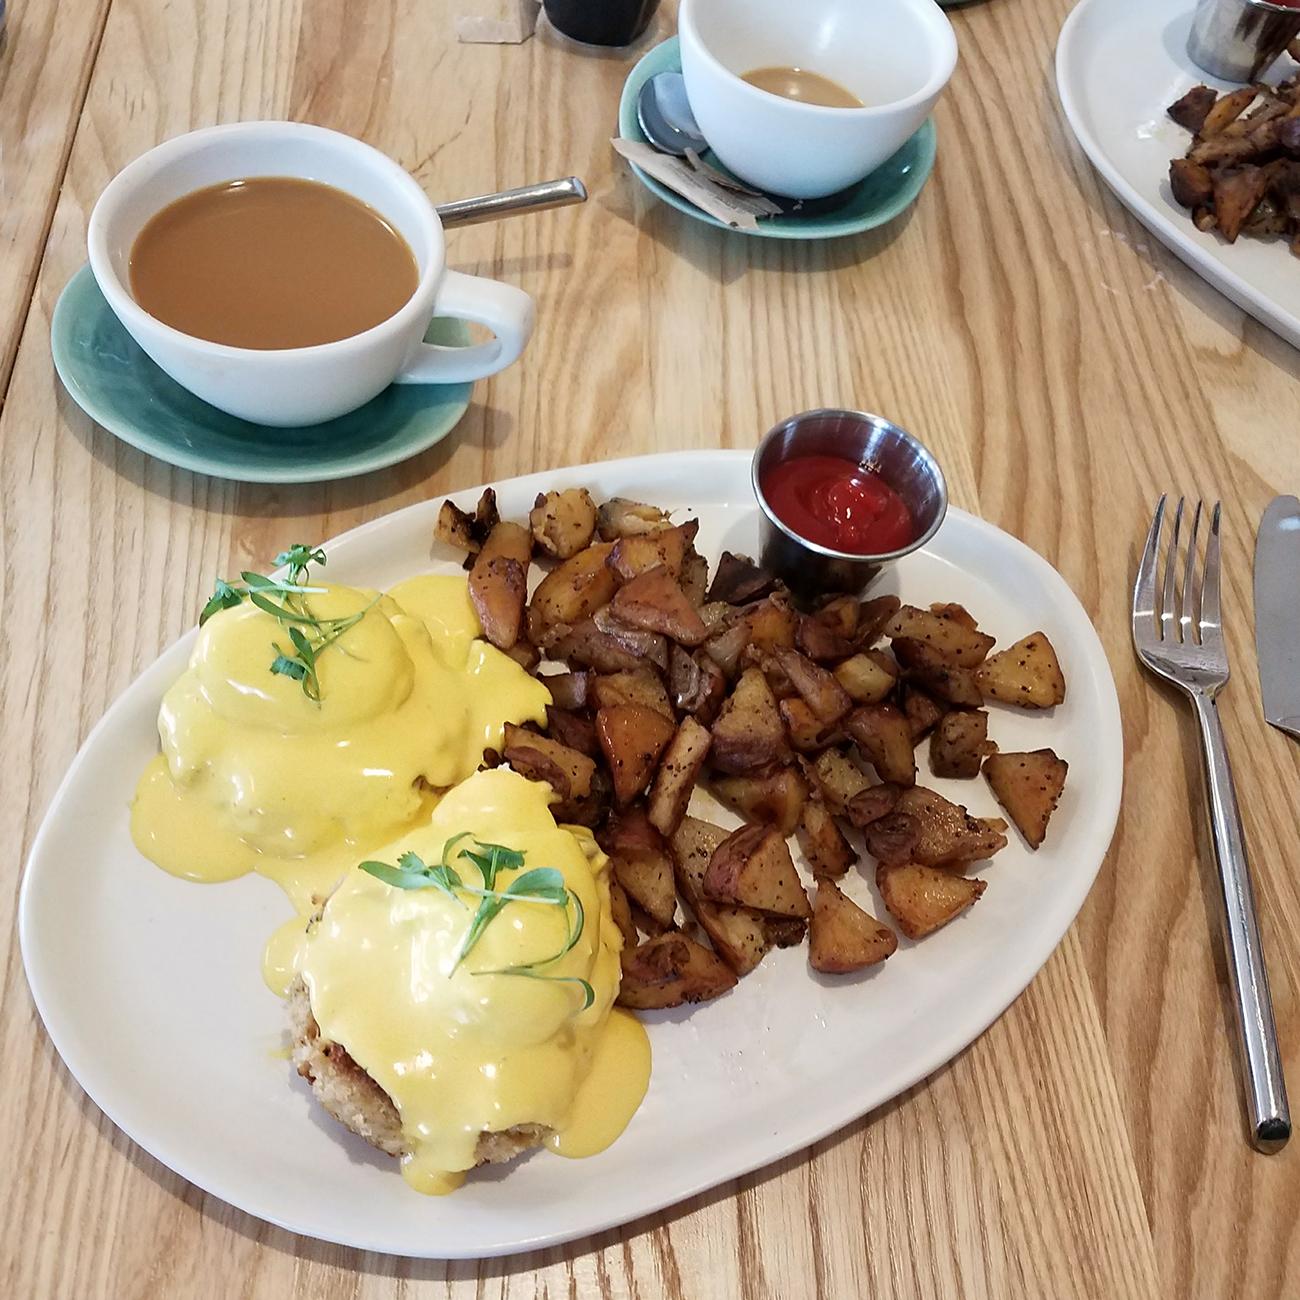 Breakfast at the Hideout Laylow Waikiki